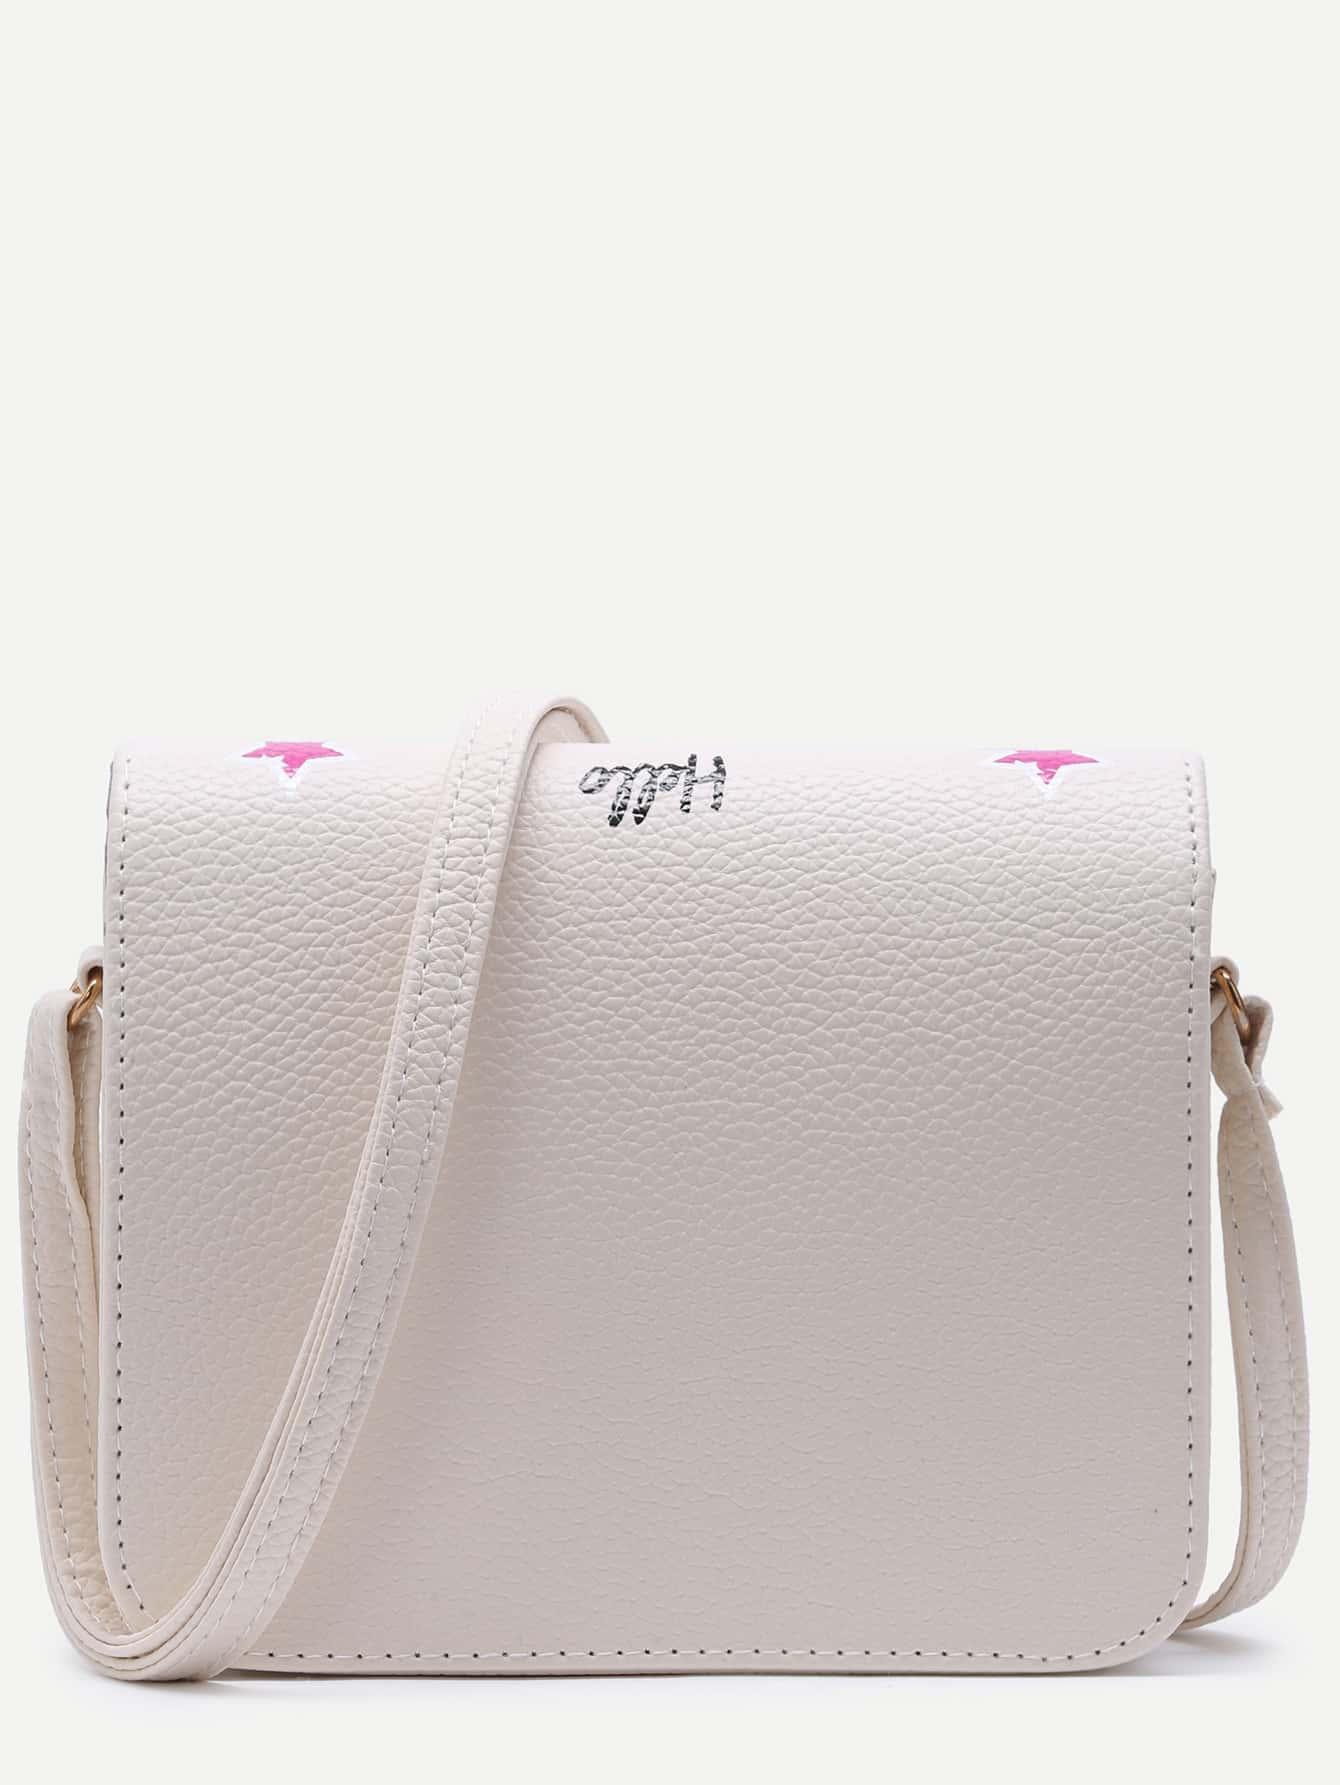 bag161020312_2